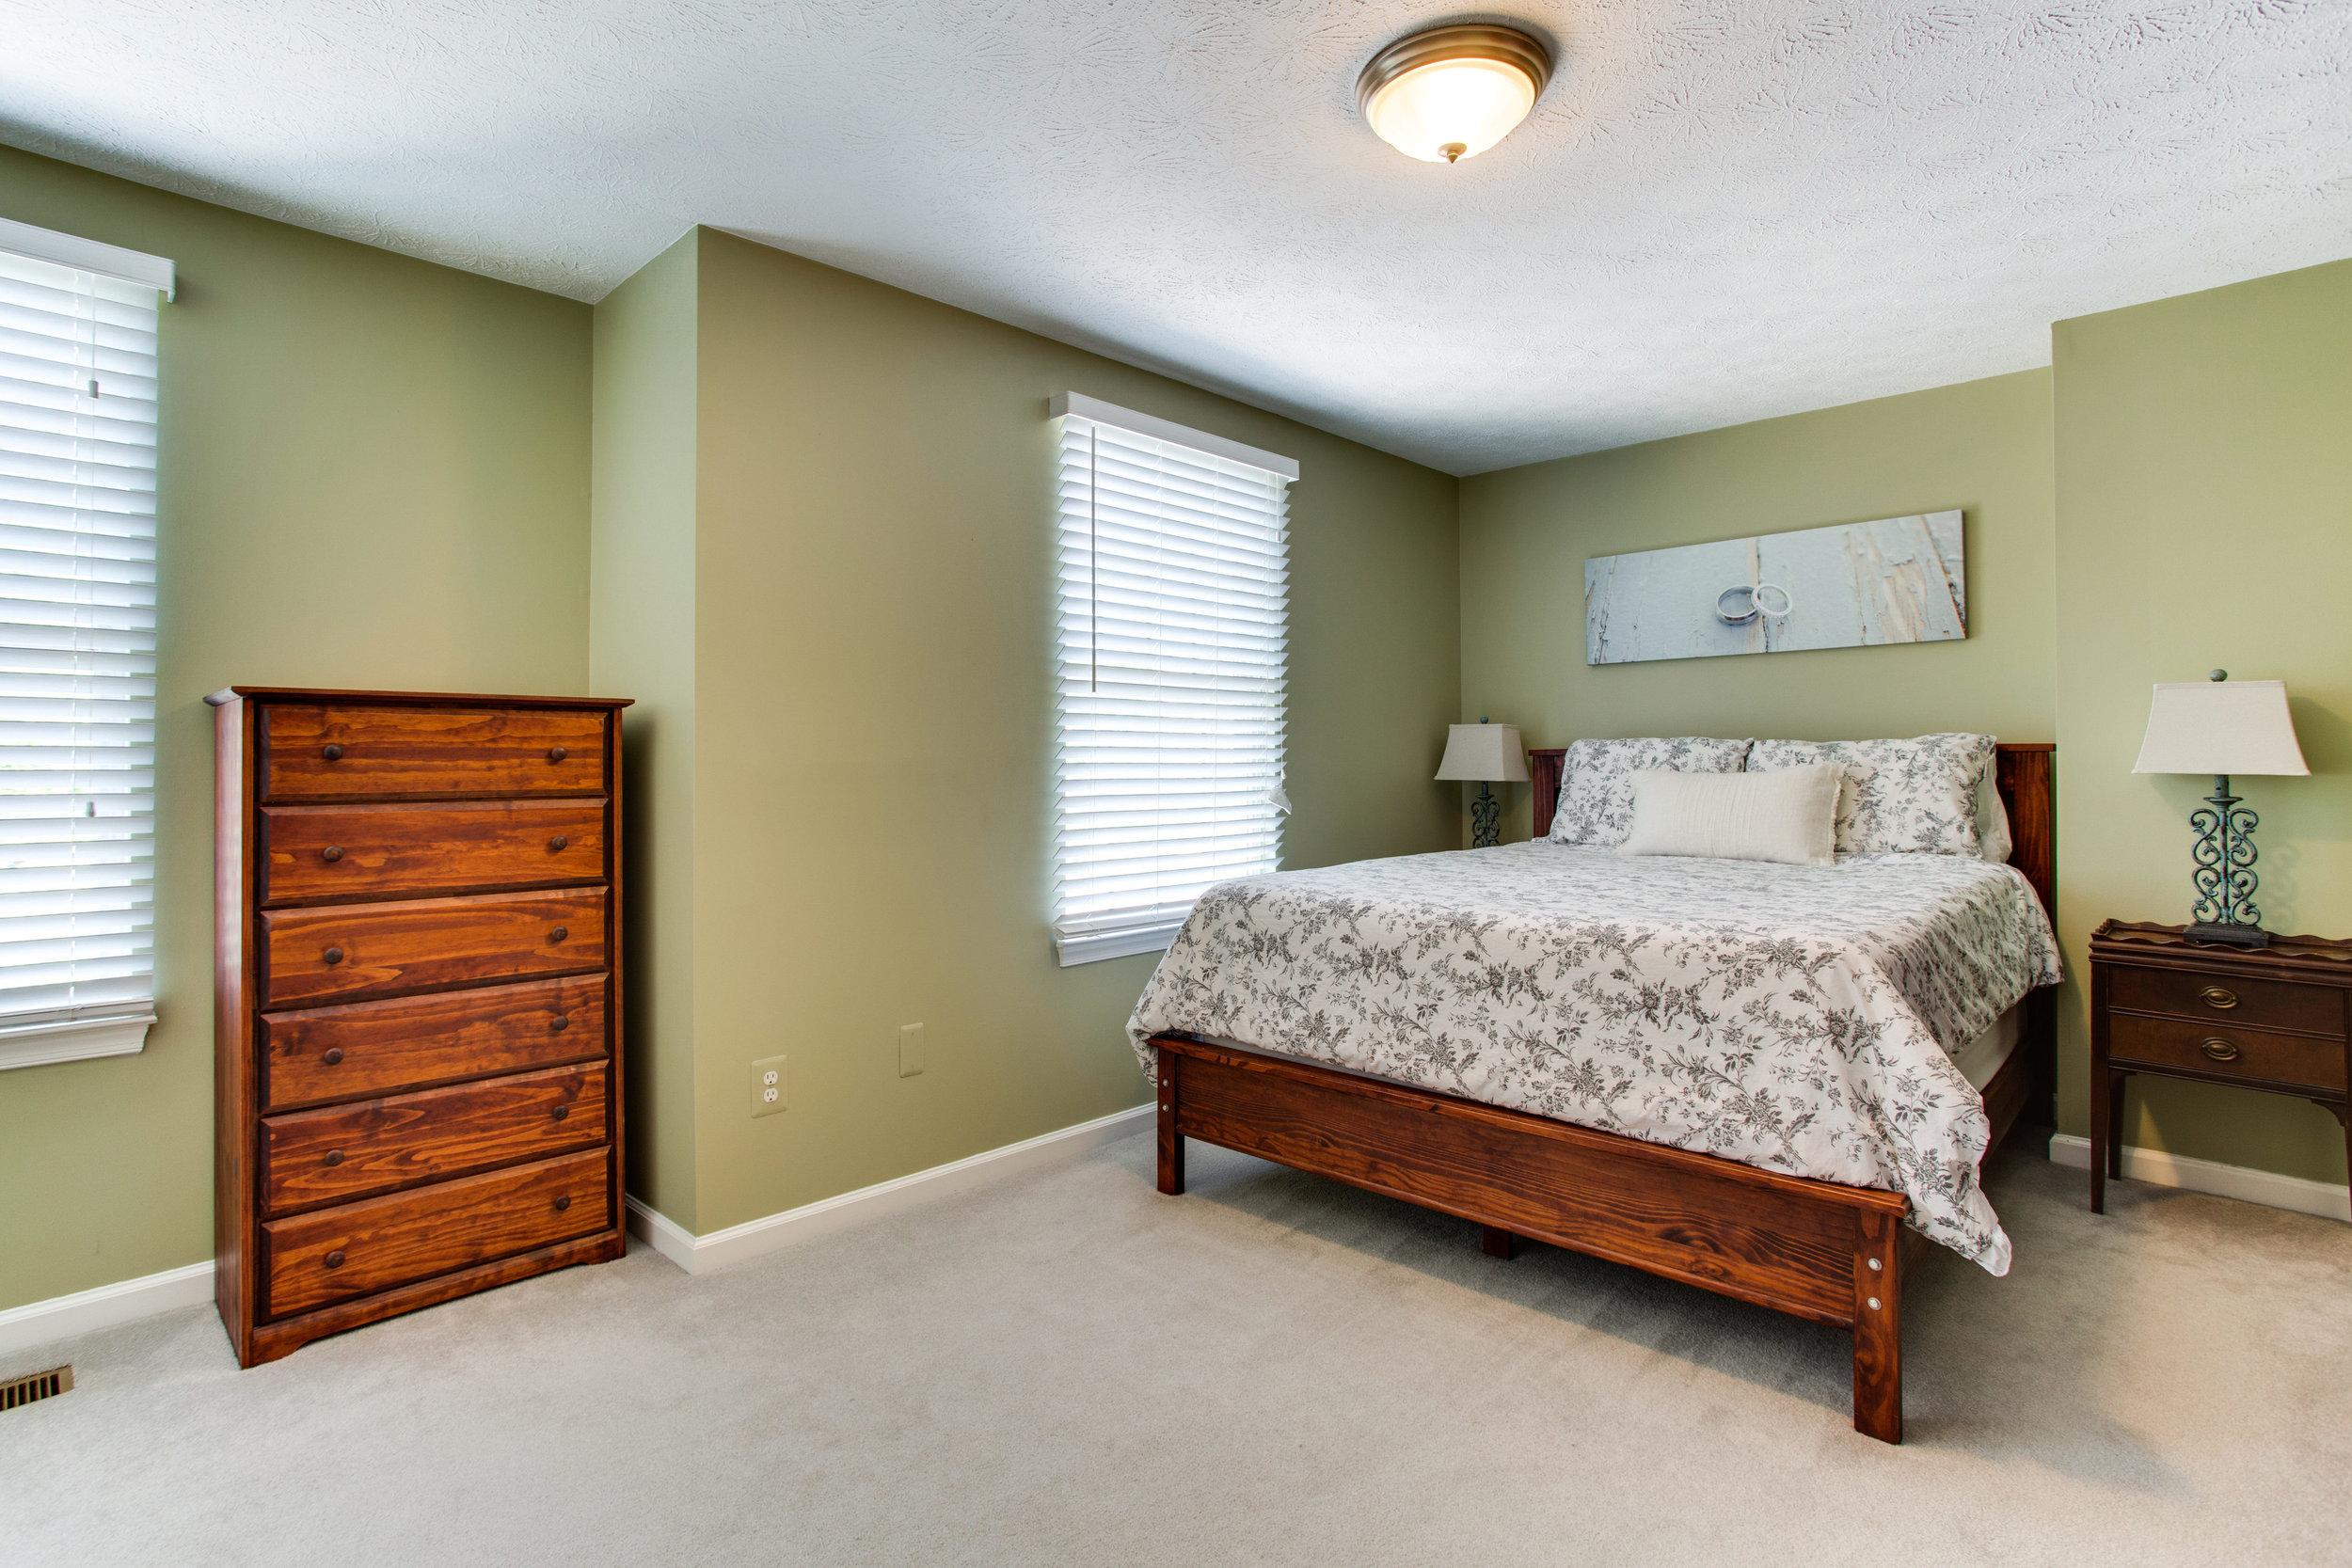 13939 Winding Ridge Ln-print-022-79-Master Bedroom-4200x2800-300dpi.jpg